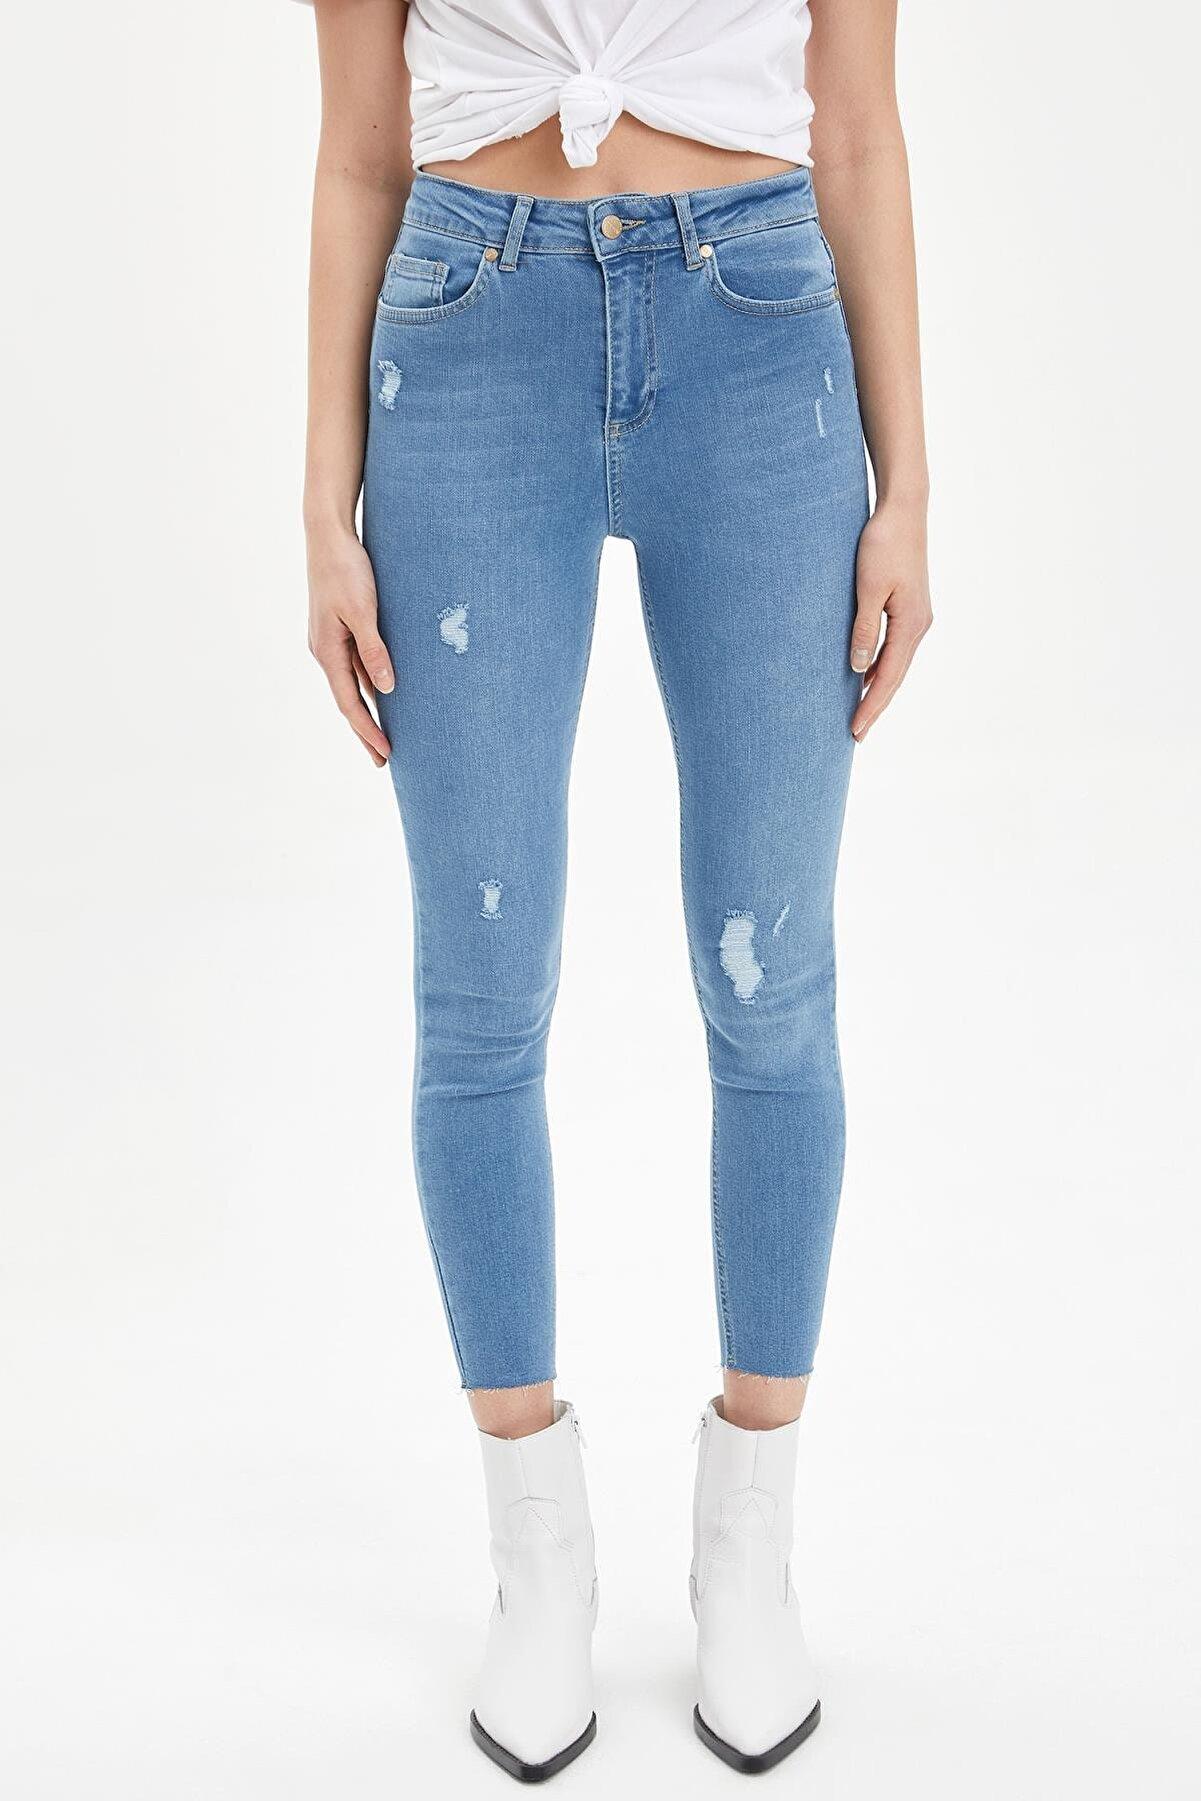 Defacto Anna Ankle Super Skinny Fit Yırtık Detaylı Jean Pantolon